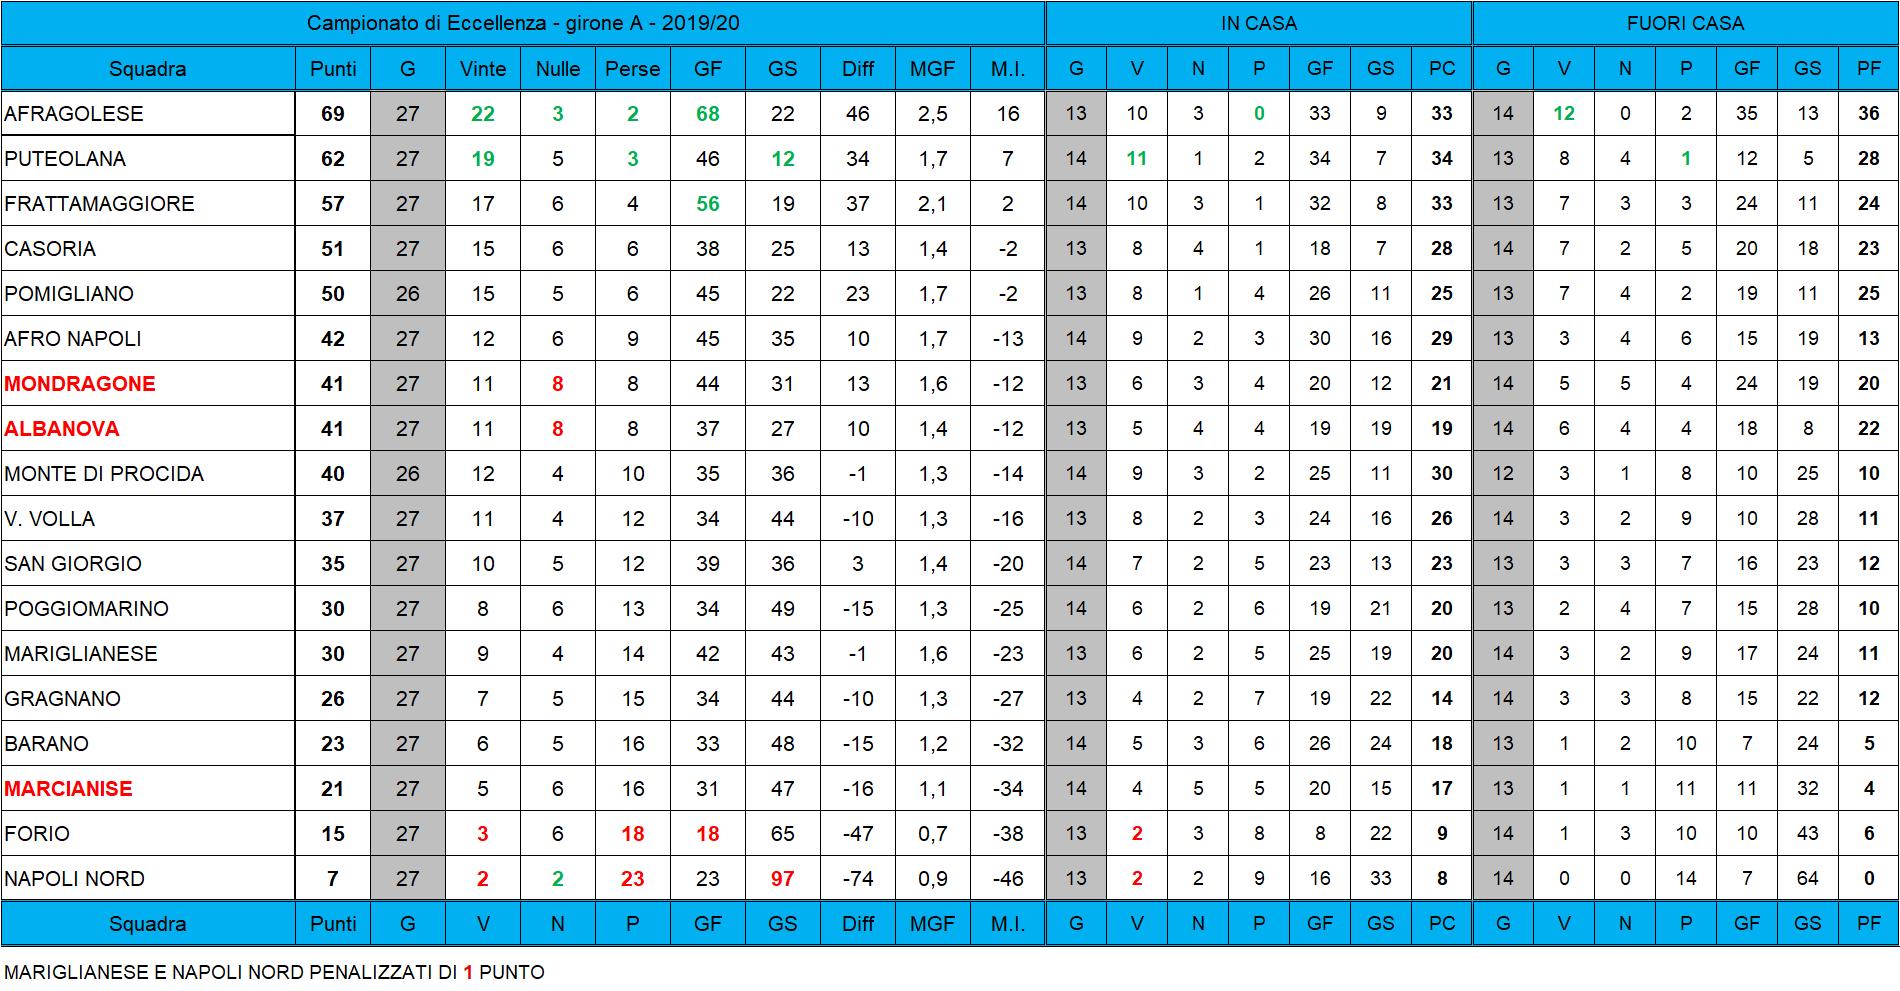 Classifica Eccellenza Girone A 2019 20